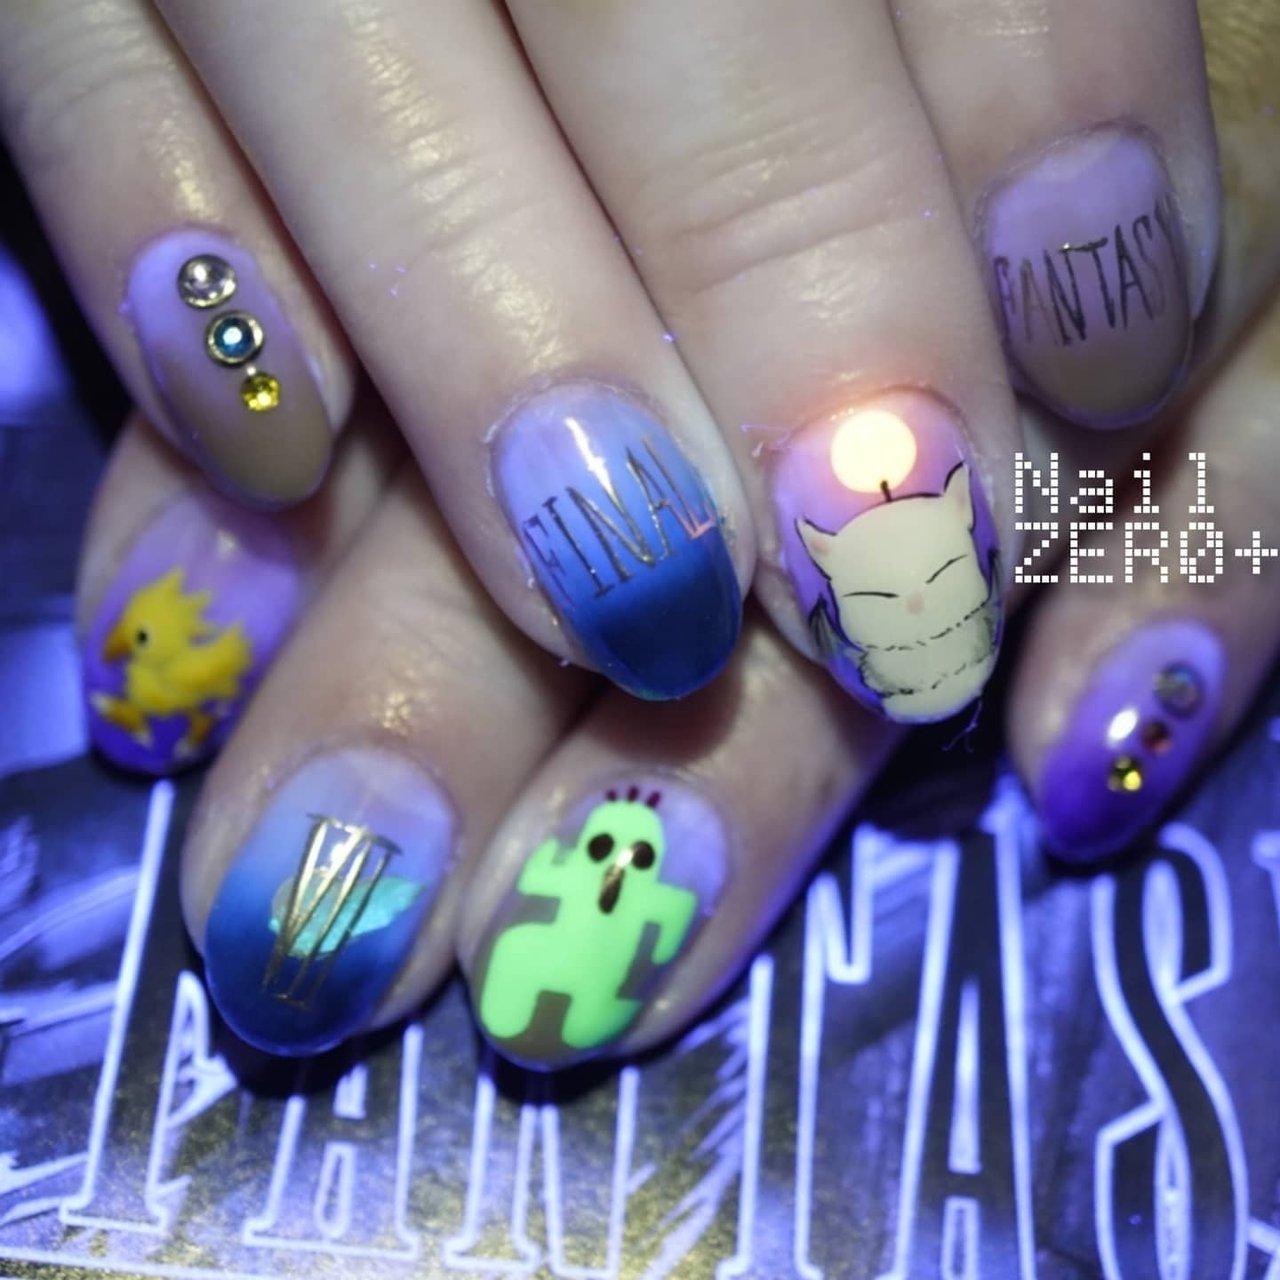 FINAL FANTASY Nails FINAL FANTASYを代表するマスコットと7リメイクをプレイ中とのことでⅦのロゴ  #nailzeroplus #ネイルゼロプラス #FINALFANTASY #finalfantasy7remake #チョコボ #chocobo #moogle #cactuar #tonberry #nail #ネイル  #ネイルアート #followme #美甲#美爪  #ikebukuro #mensnailist  #手描きアート #art #sofiragel #東京 #ジェルネイル #池袋 #メンズネイリスト#nailbook #ネイルブック #春ネイル #japanesenails #japannails #ネイリスト募集中 #オールシーズン #女子会 #ハンド #グラデーション #ワンカラー #キャラクター #ミディアム #パープル #カラフル #ジェル #お客様 #塩見隼人 [池袋]ネイルゼロプラス #ネイルブック